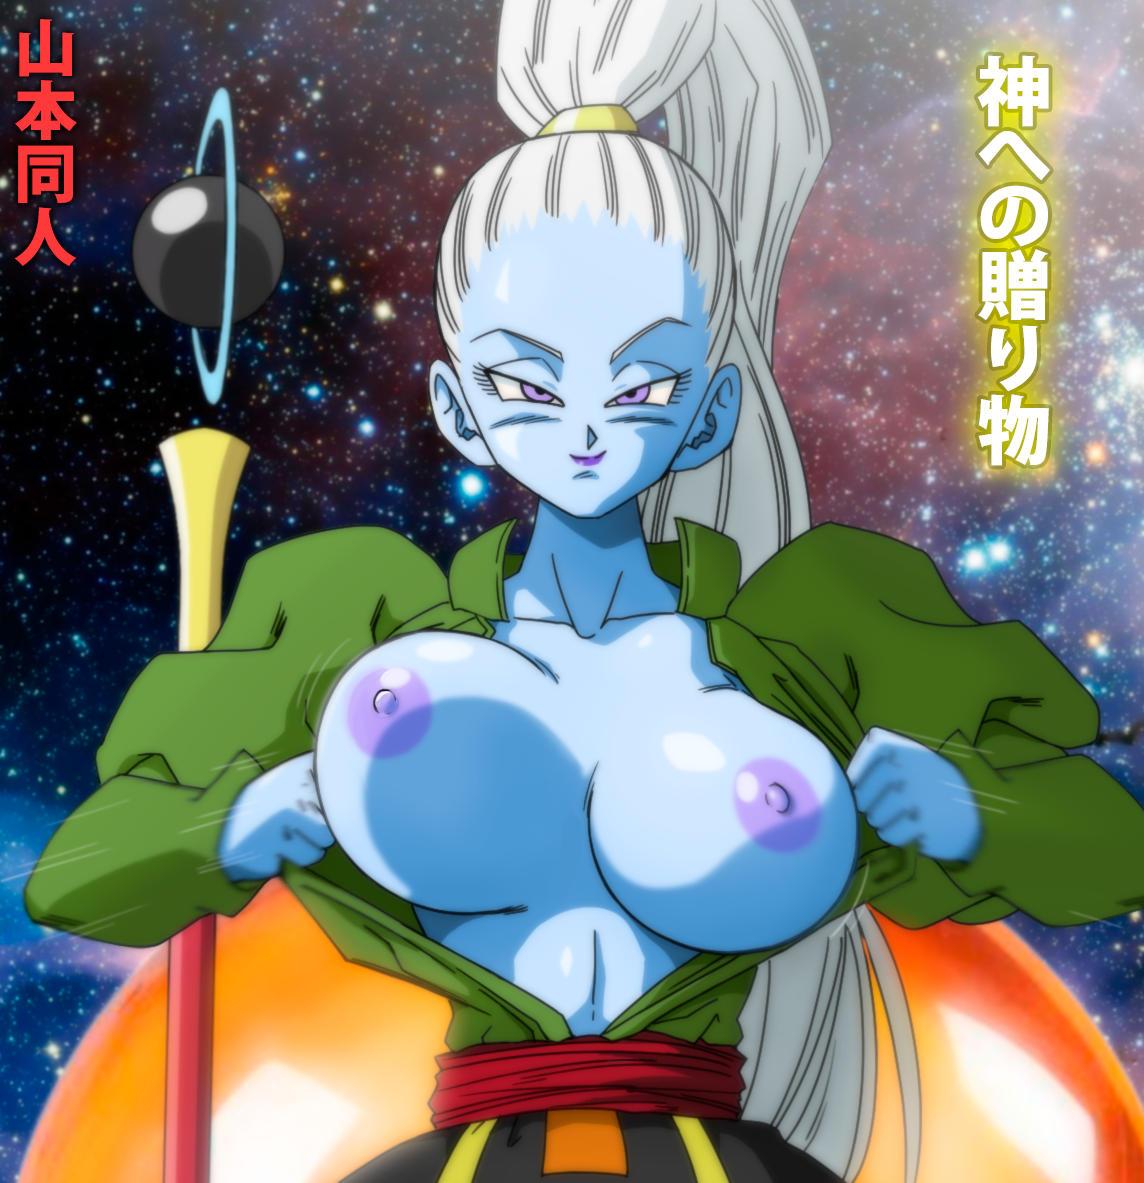 female majin ball dragon xenoverse Sofia the first rule3 4